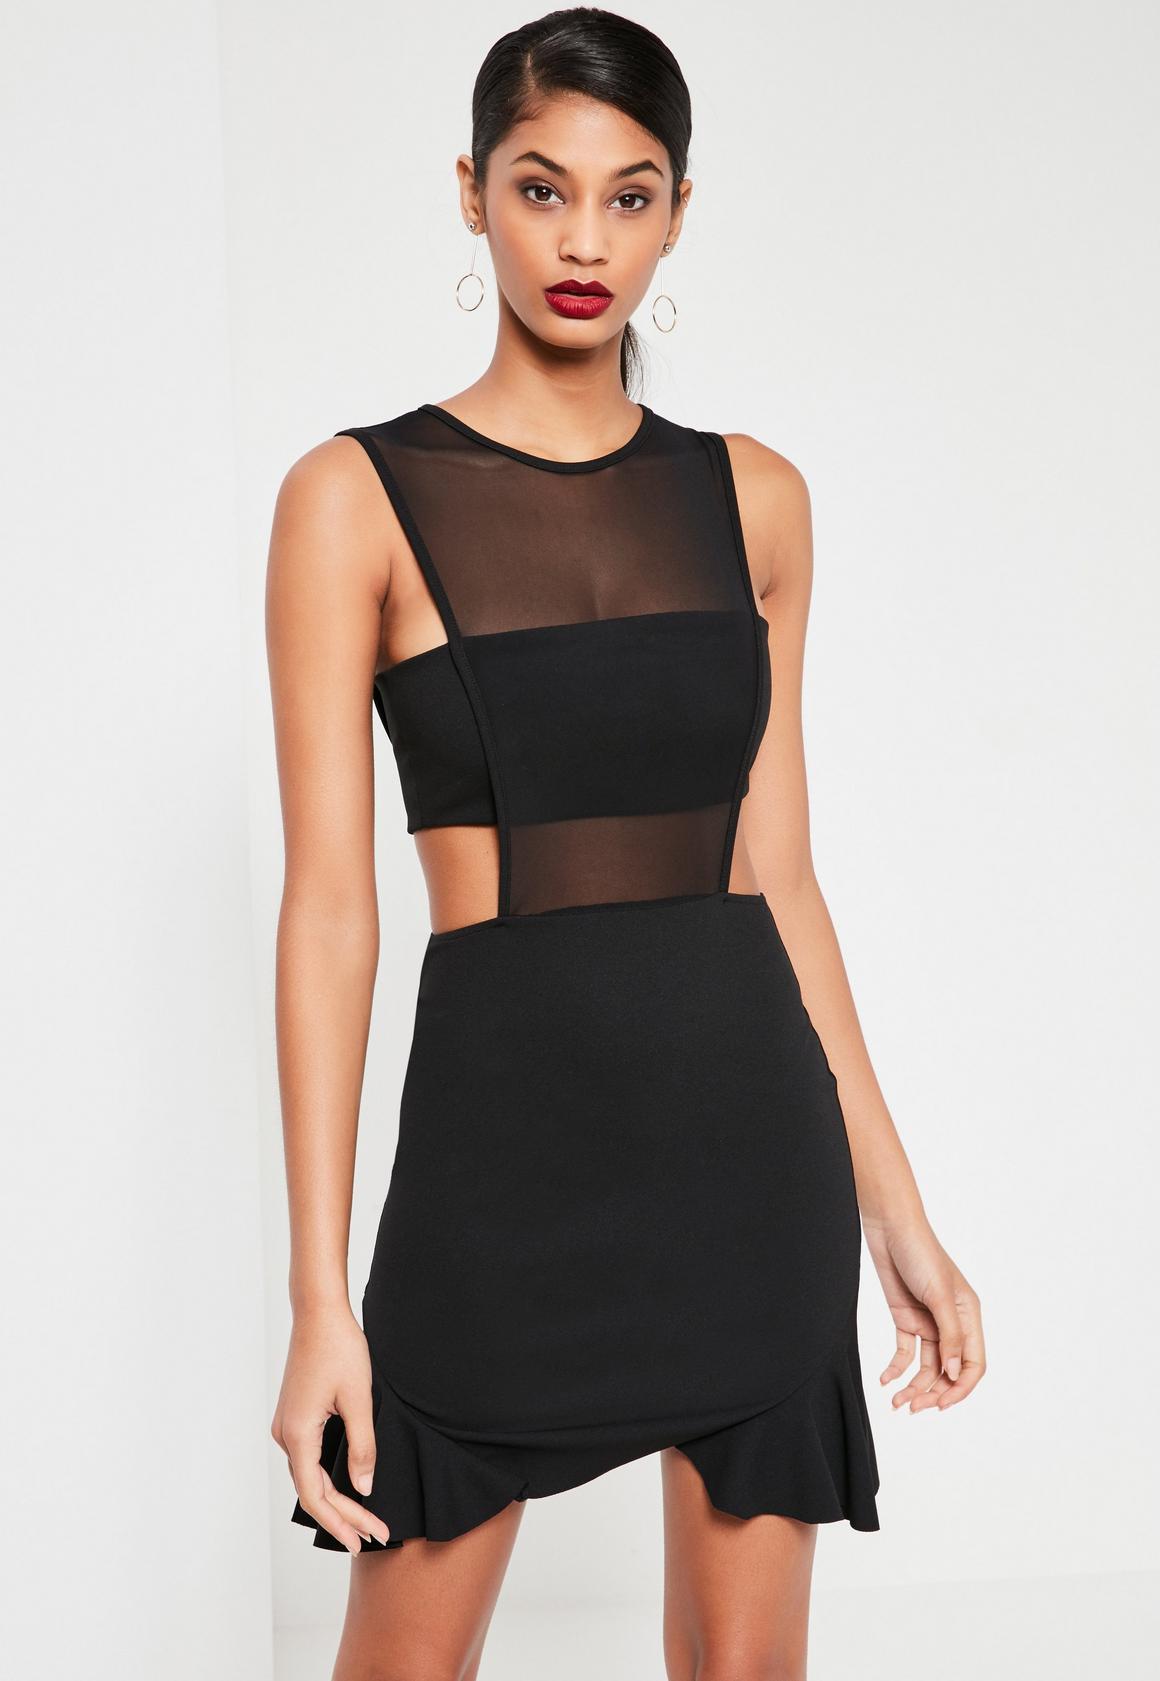 Black Mesh Insert Frill Hem Sleeveless Mini Dress | Missguided Ireland